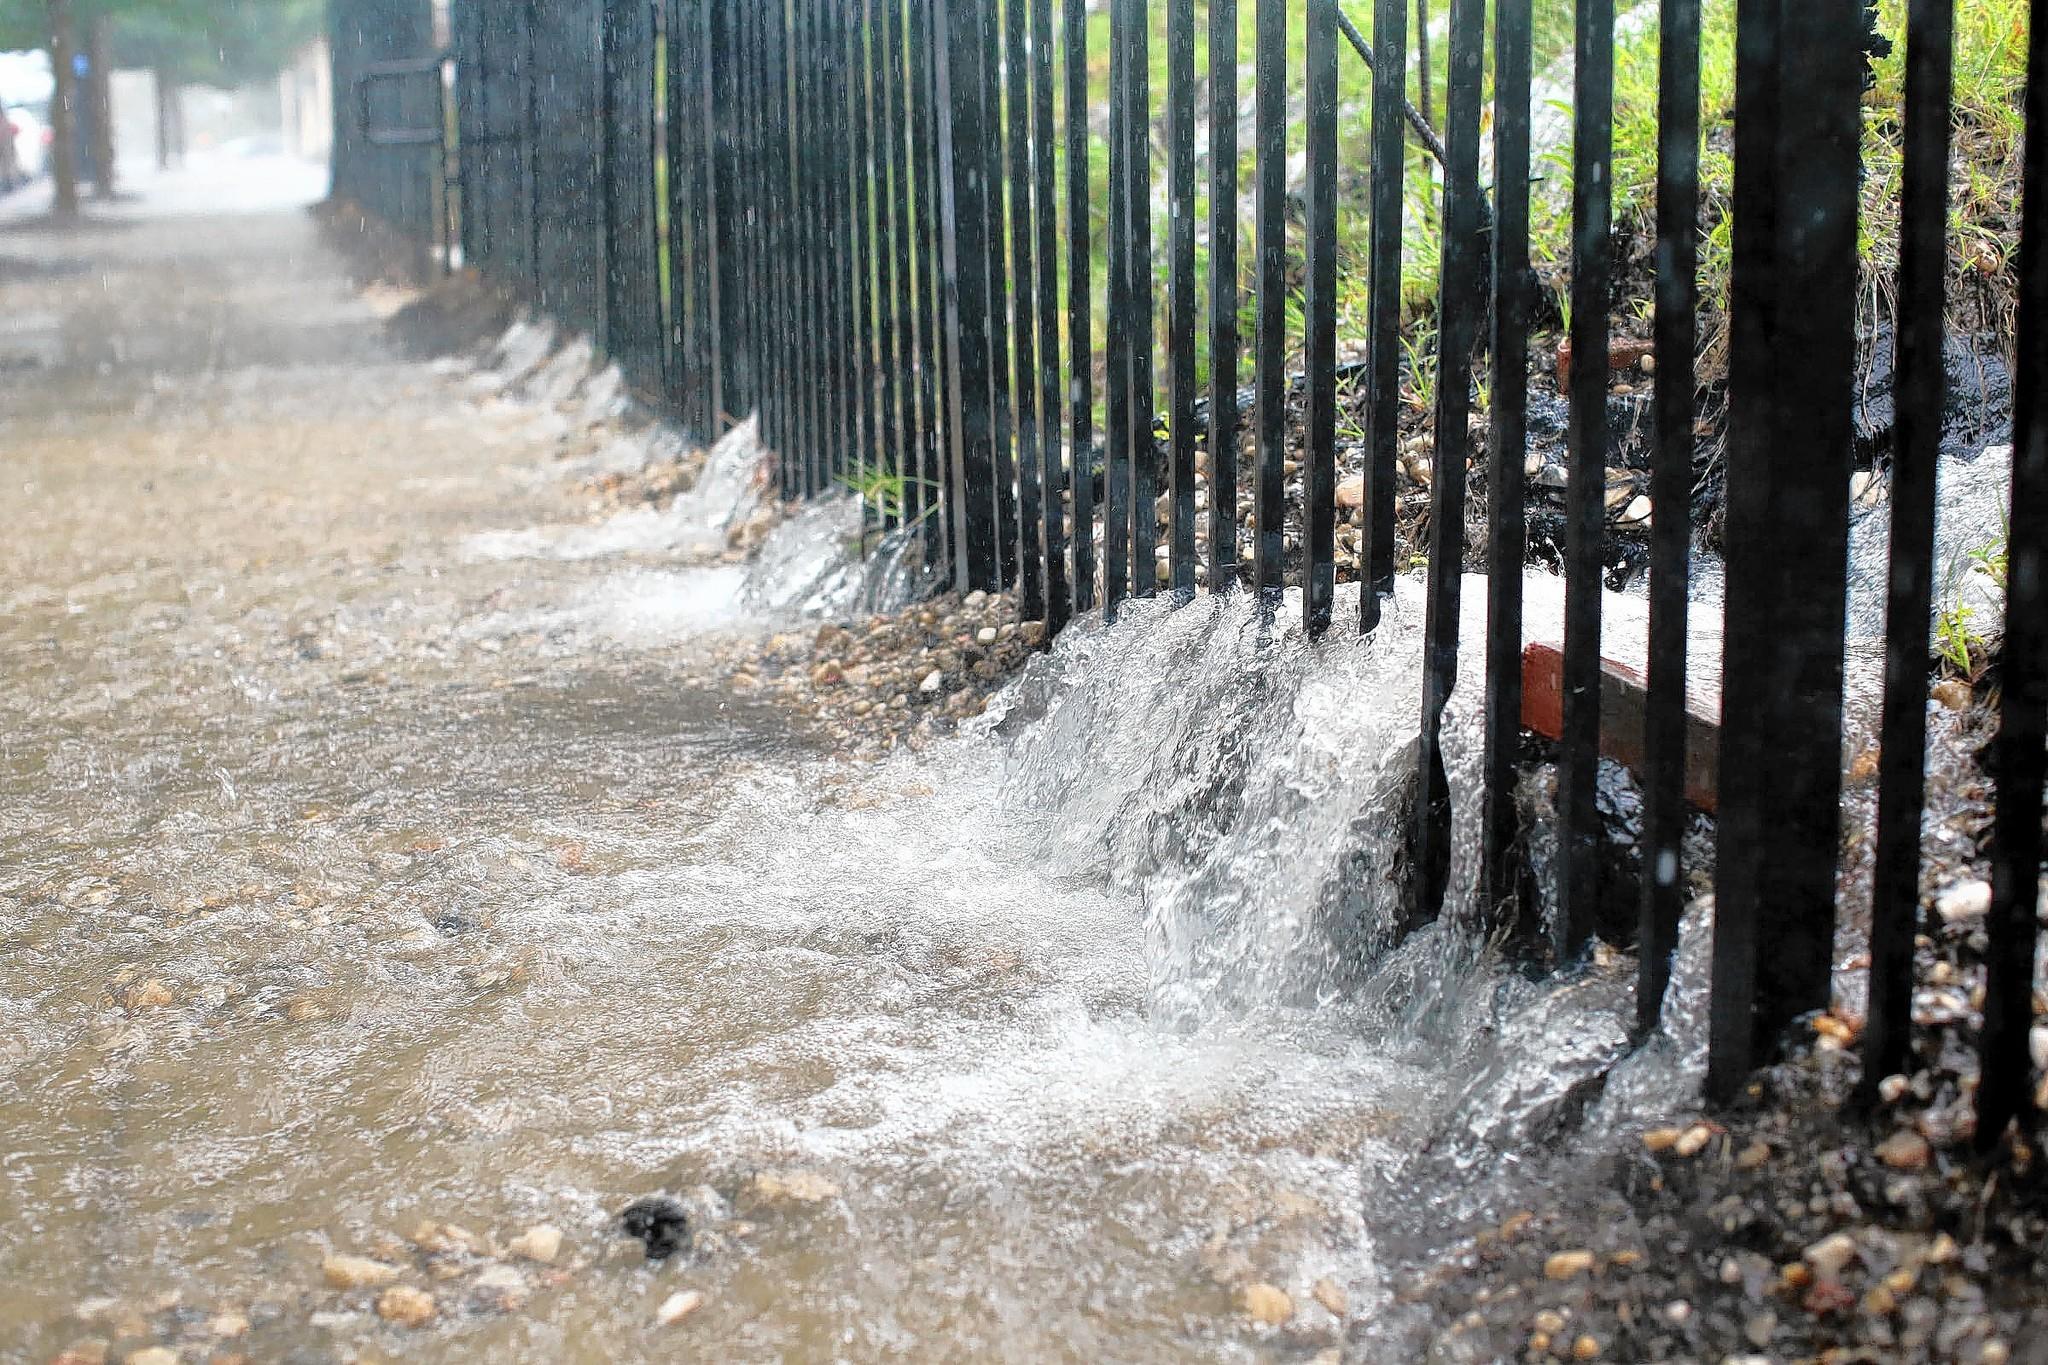 Annapolis Baltimore Lead Nation For Rise In Flooding Events Tribunedigital Baltimoresun